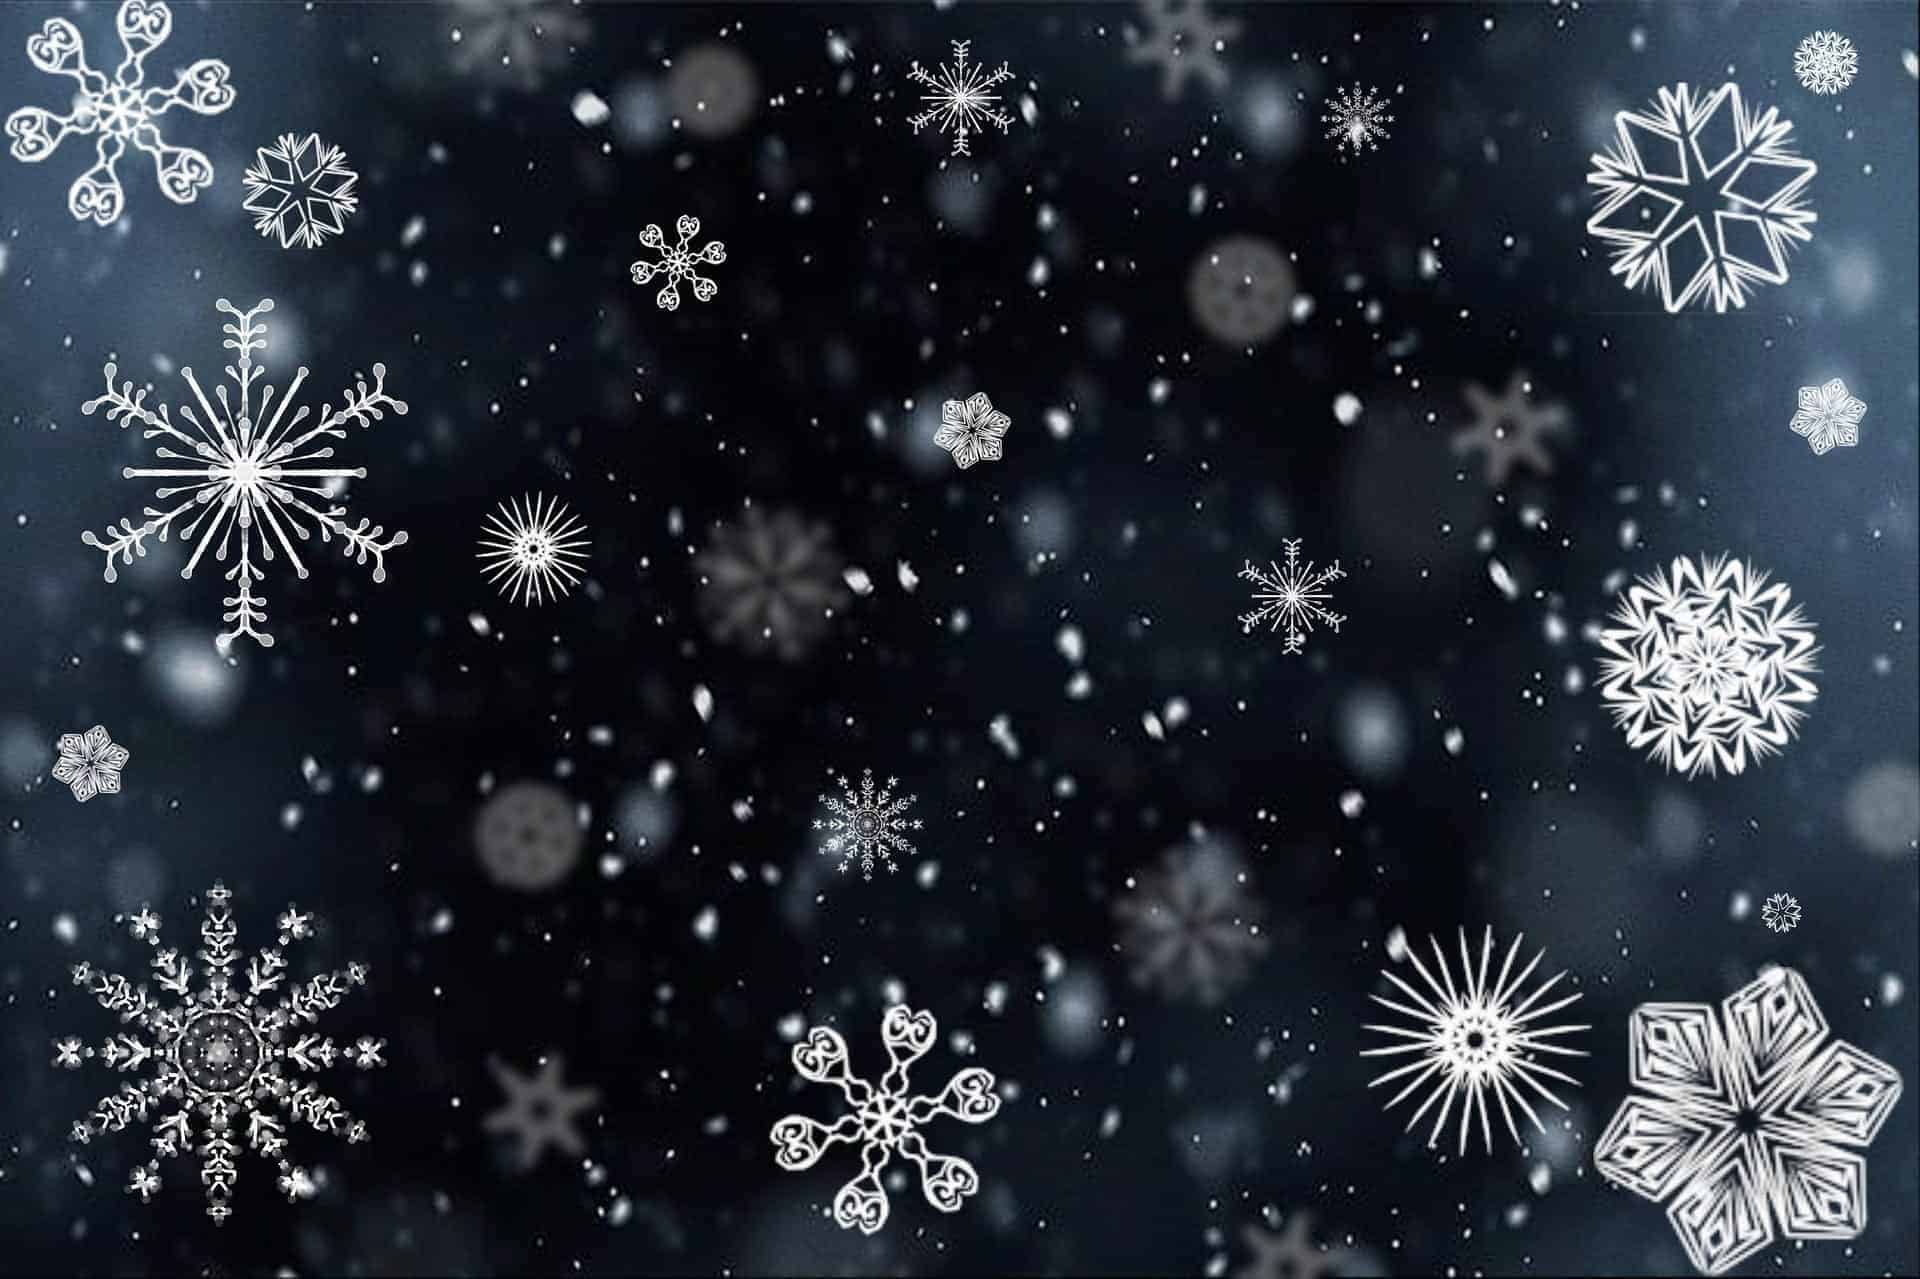 snowflake 554635 1920